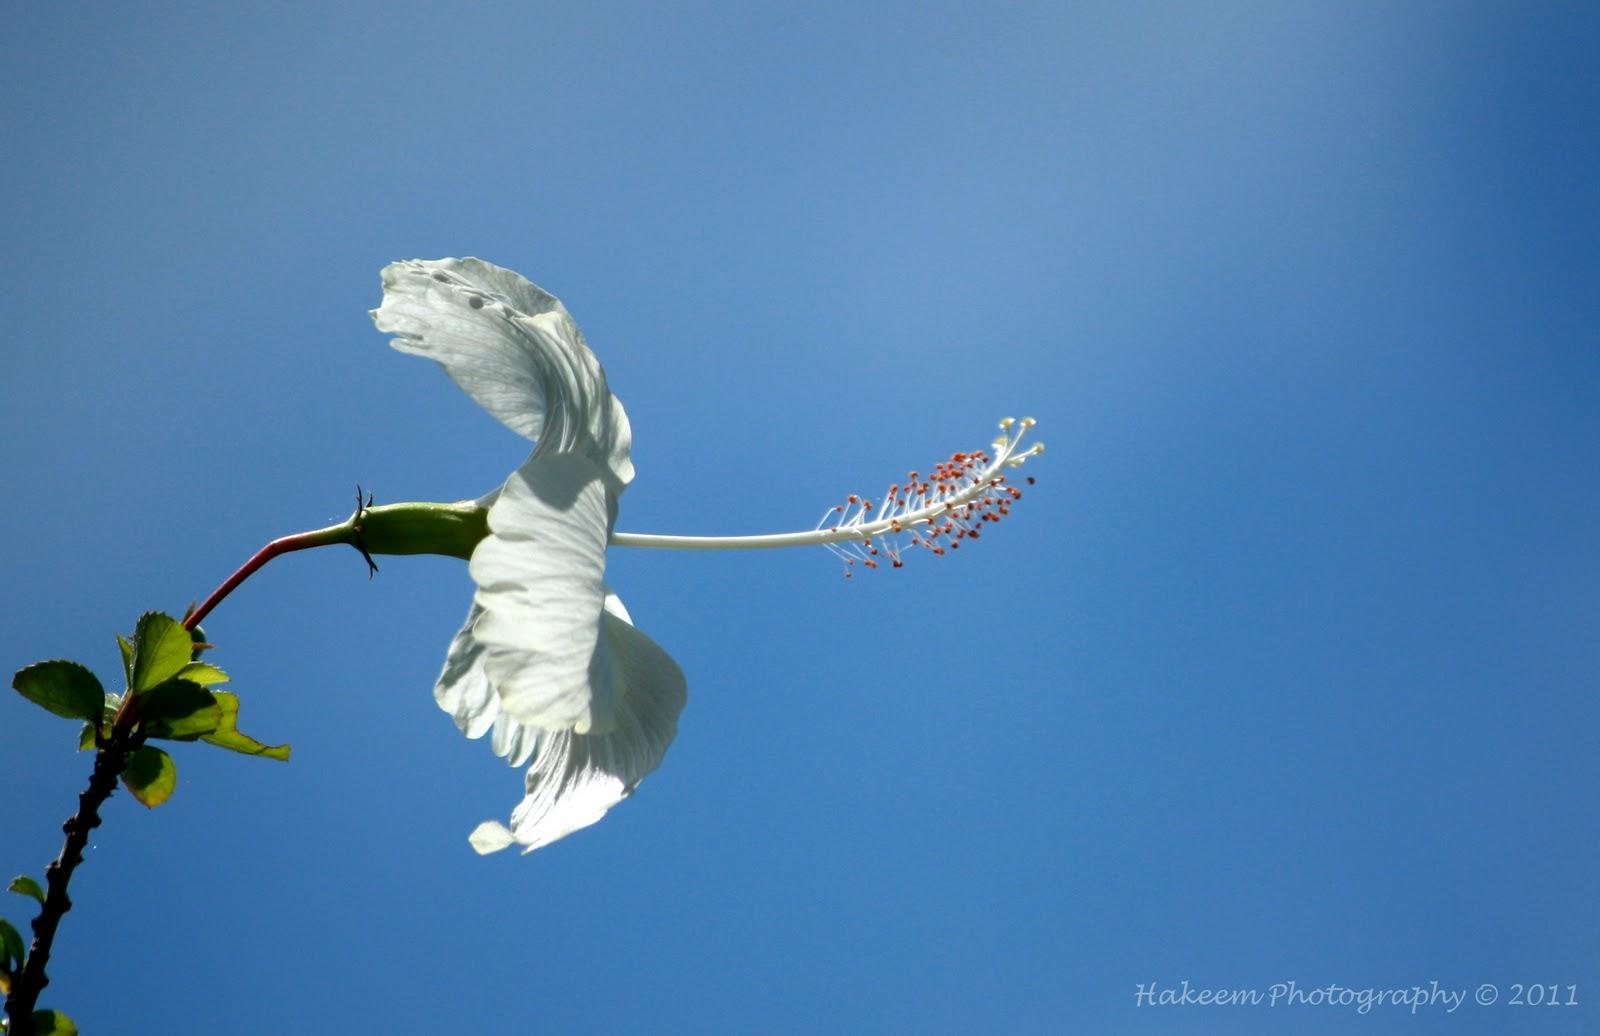 White Hisbiscus